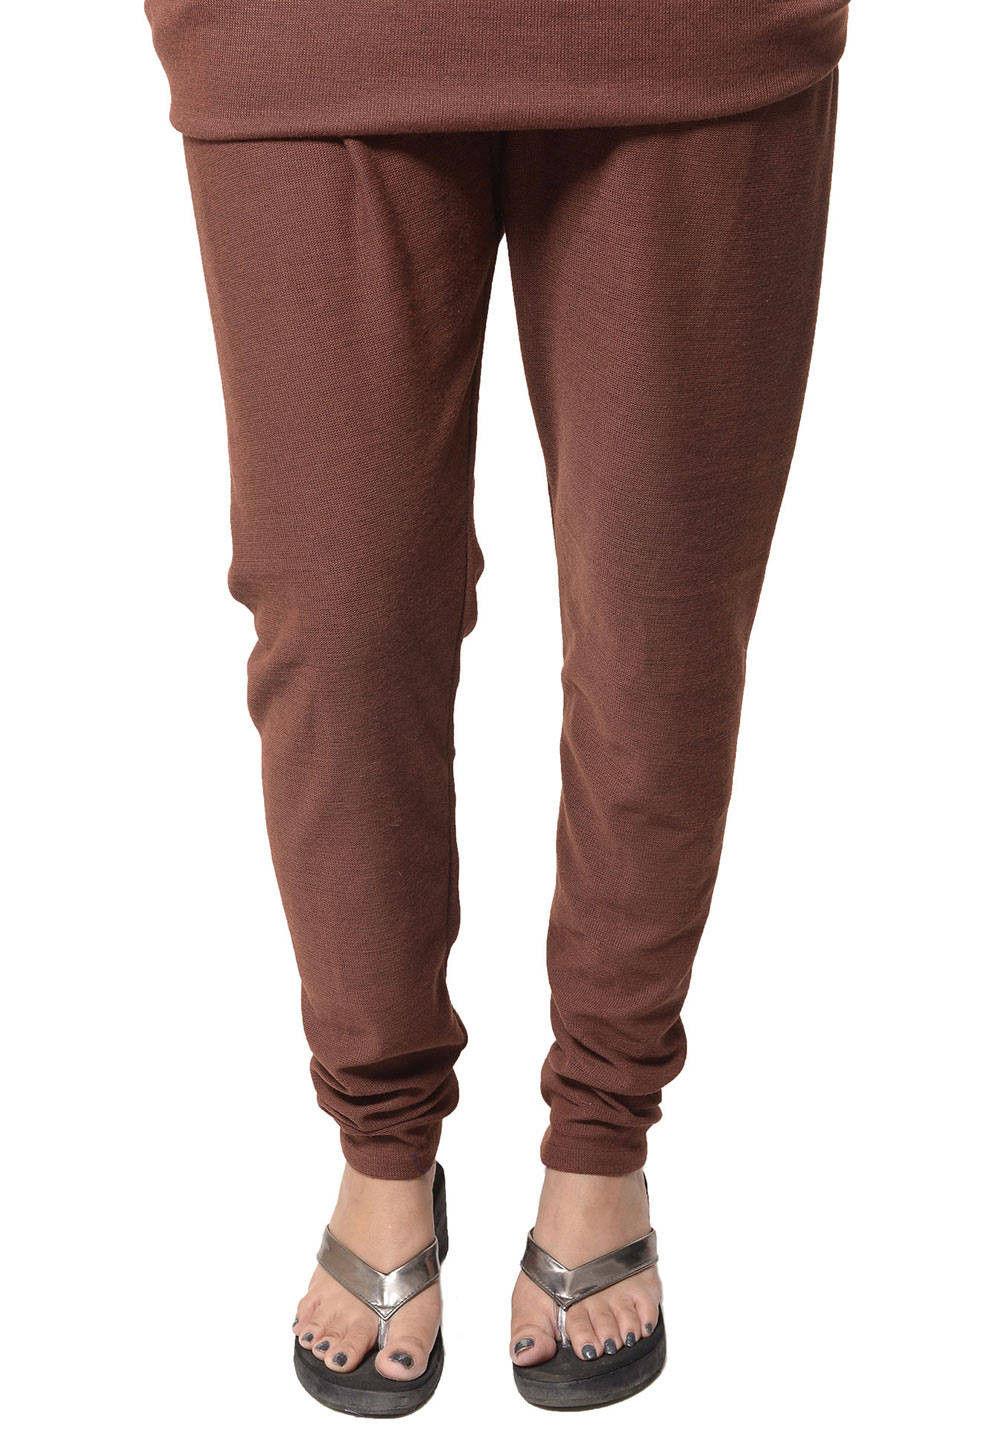 Woolen Legging in Brown